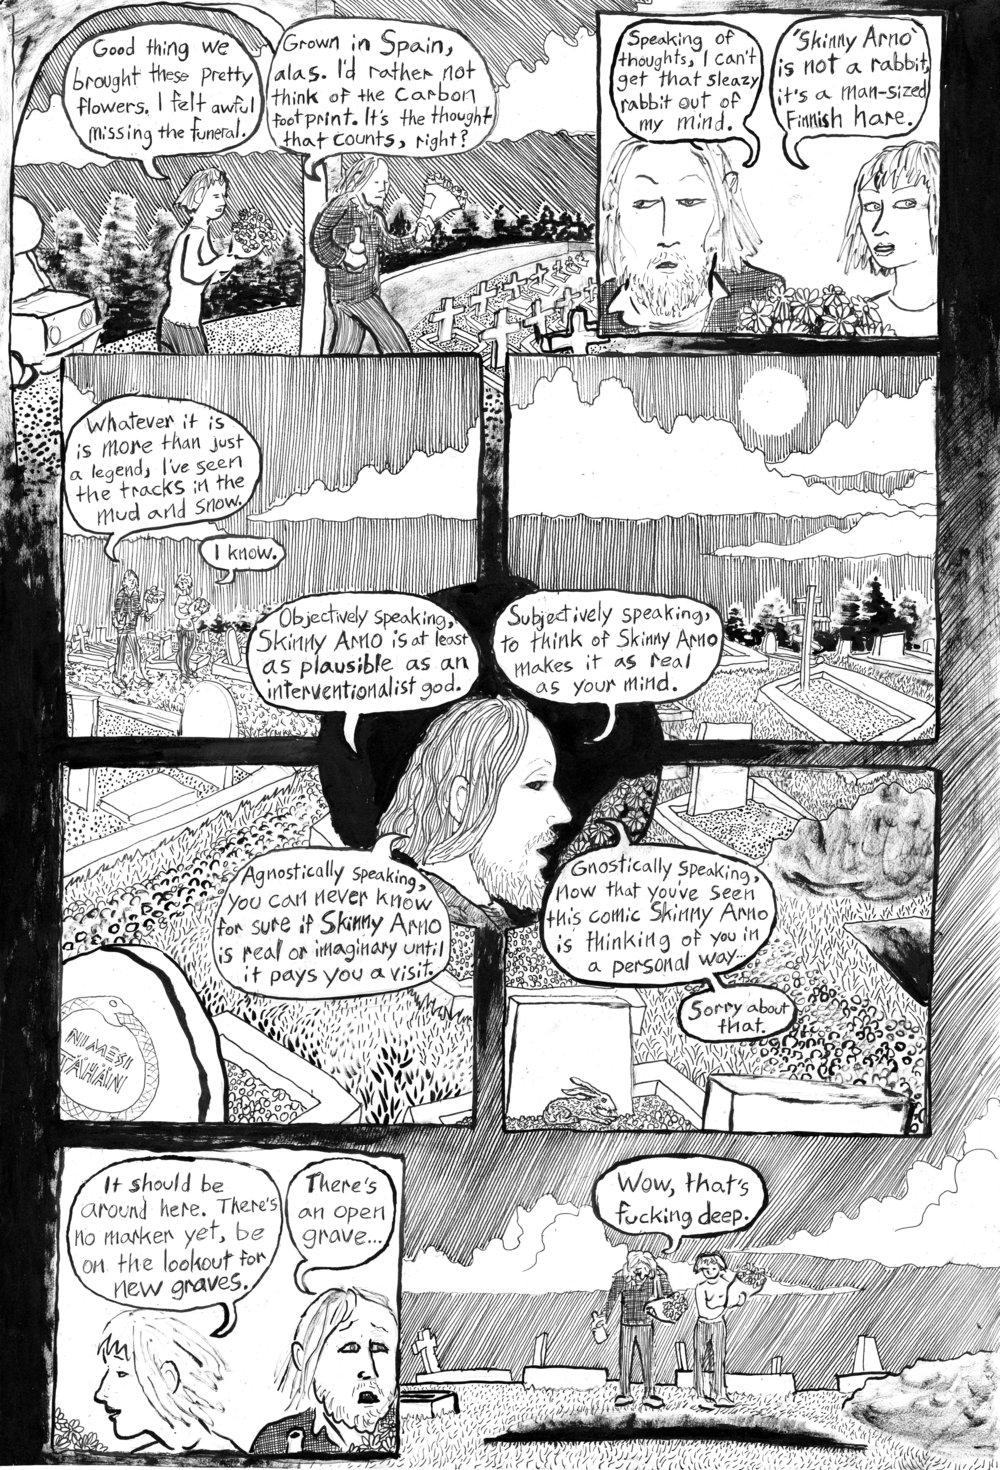 Return of Skinny Arno by morgen eljot 6.jpg